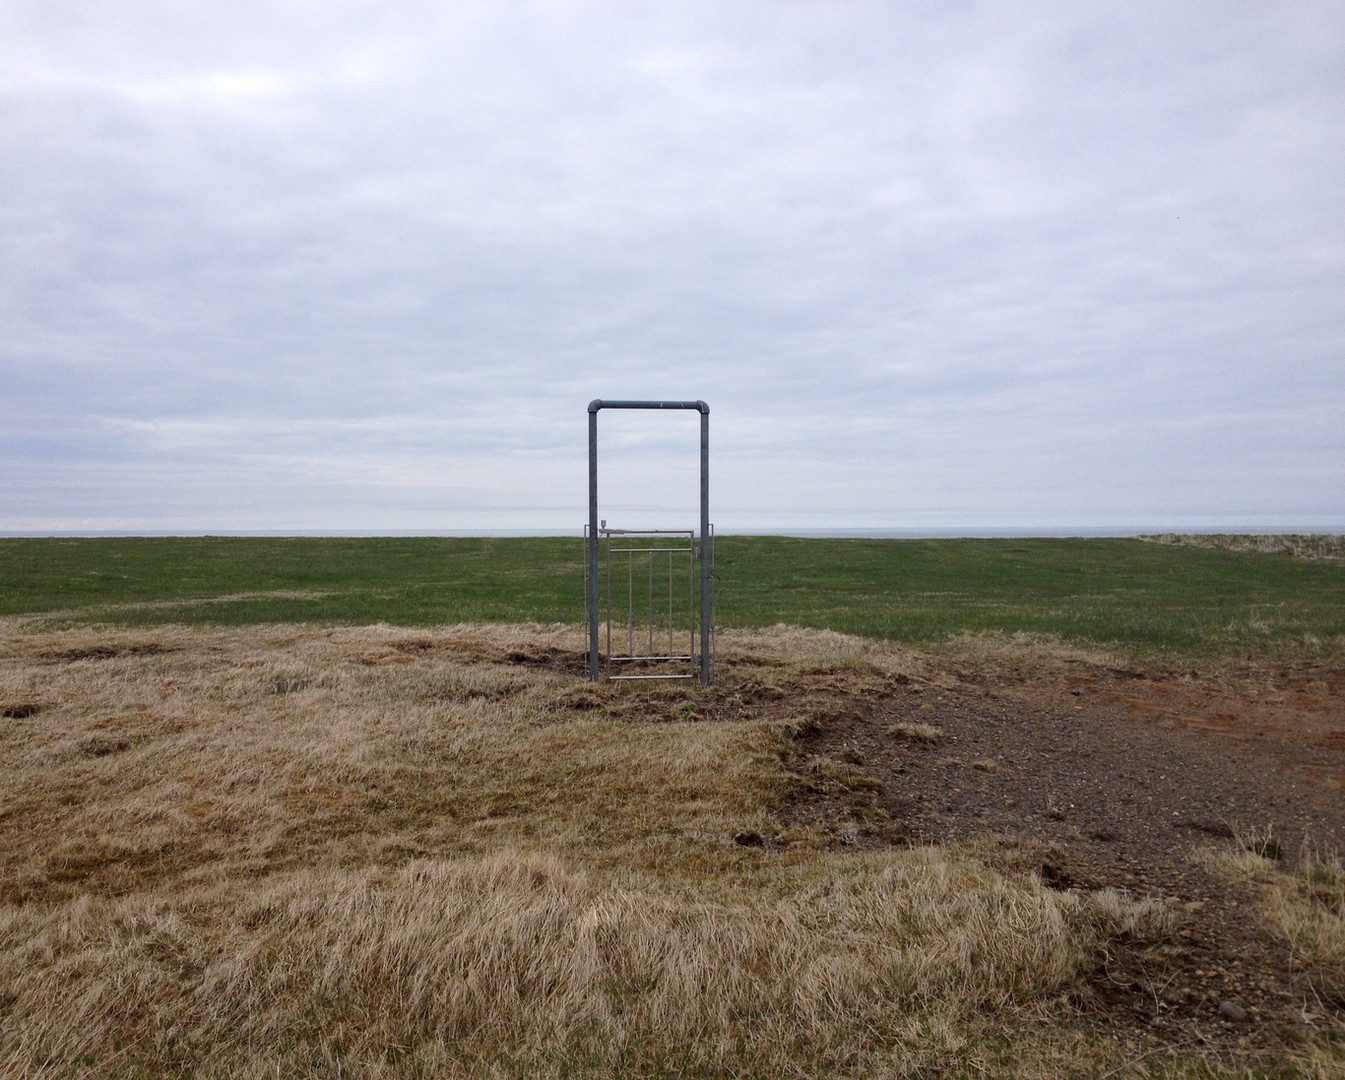 The fenceless gate